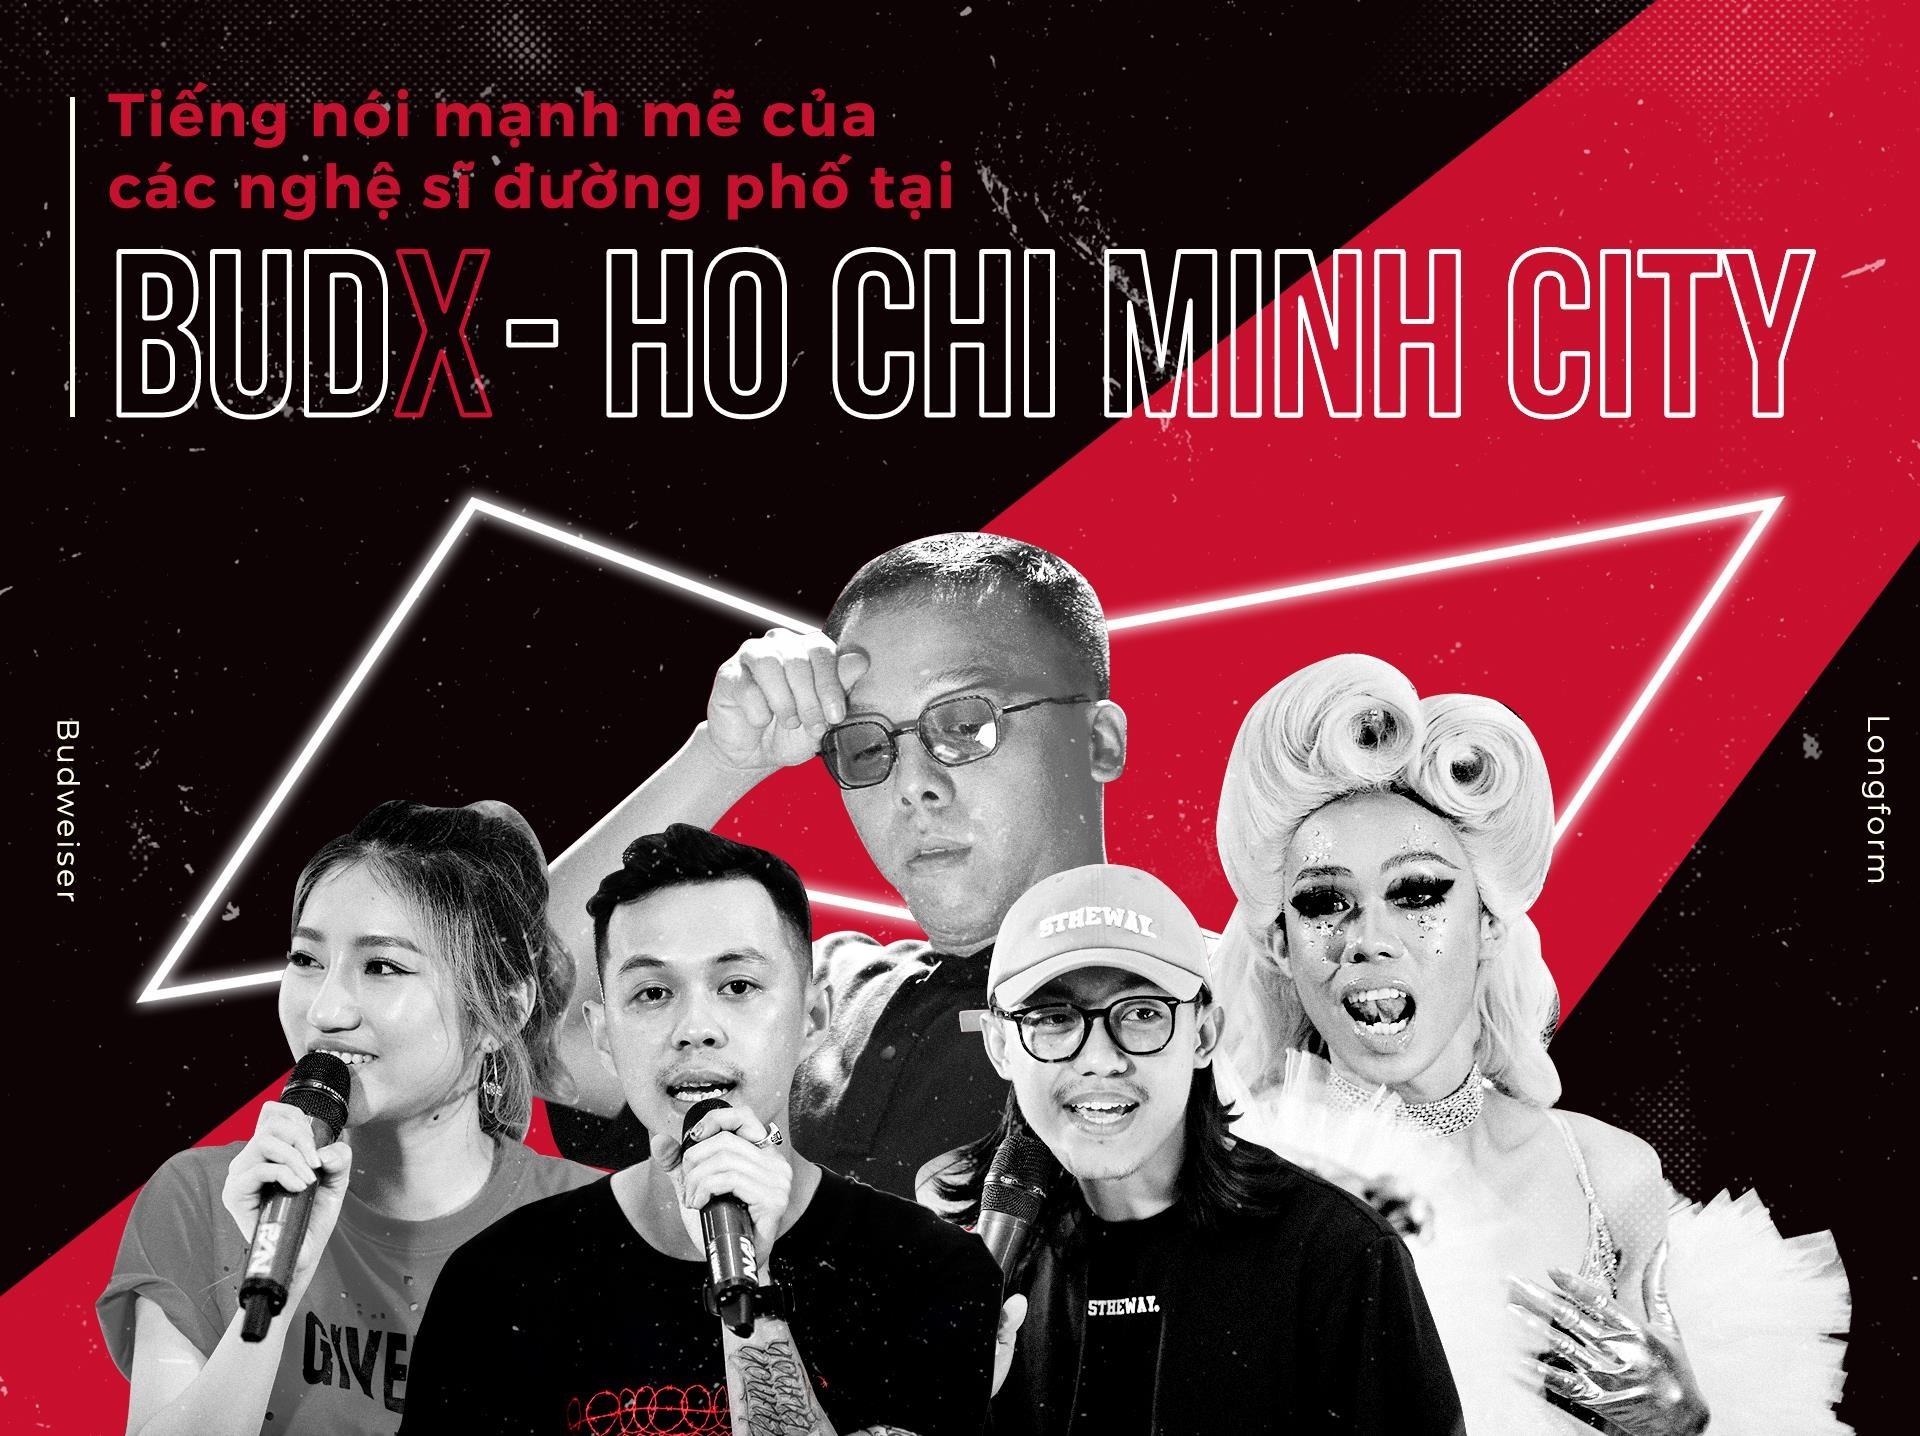 Tieng noi manh me cua cac nghe si duong pho tai Budx Ho Chi Minh City hinh anh 2